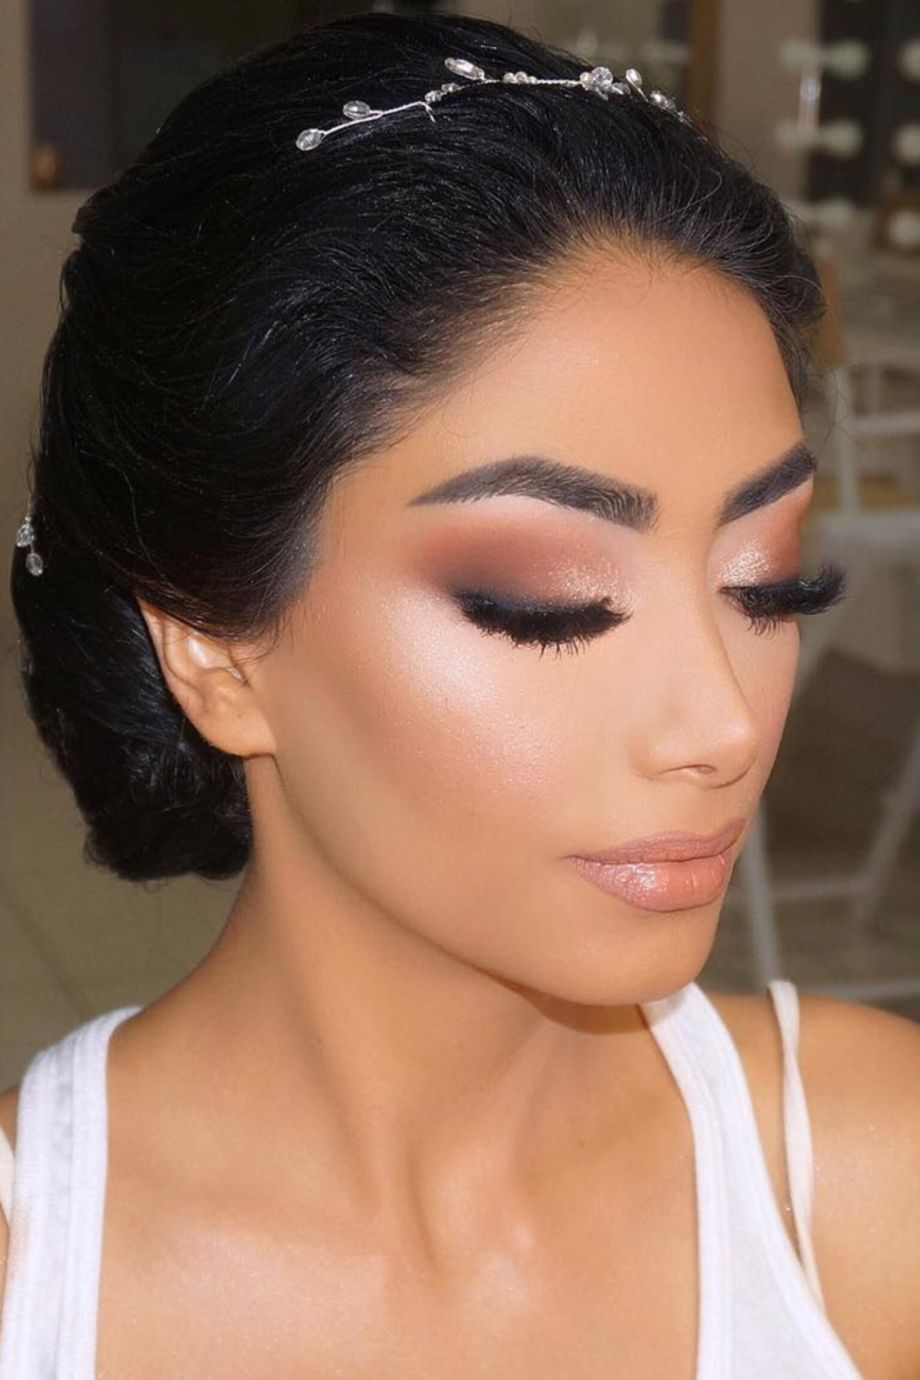 Pin by extrbdietbplan on makeup ideas Beautiful wedding